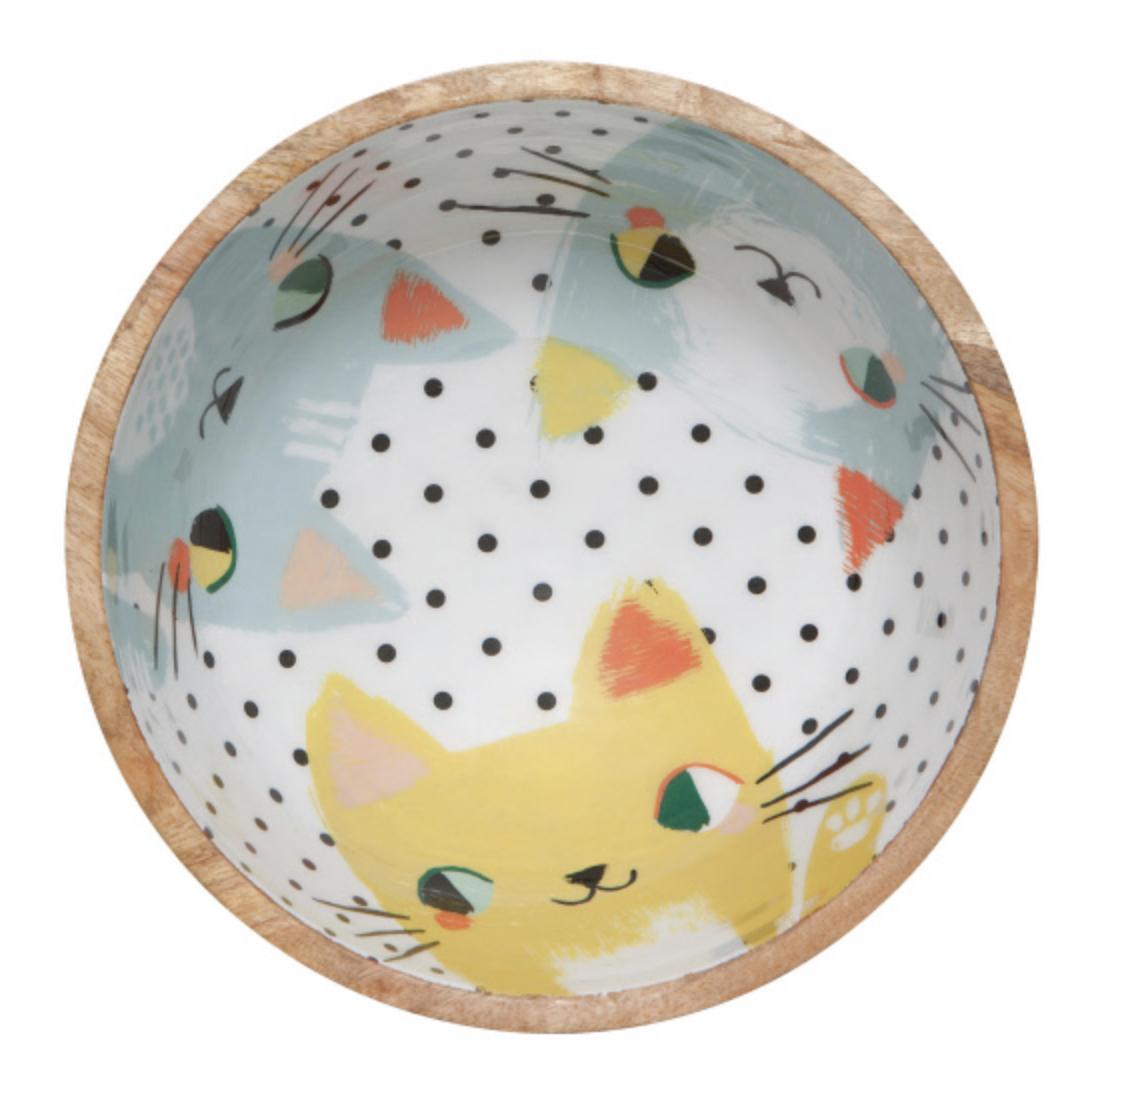 Meow Meow: Mangowood Serving Bowl